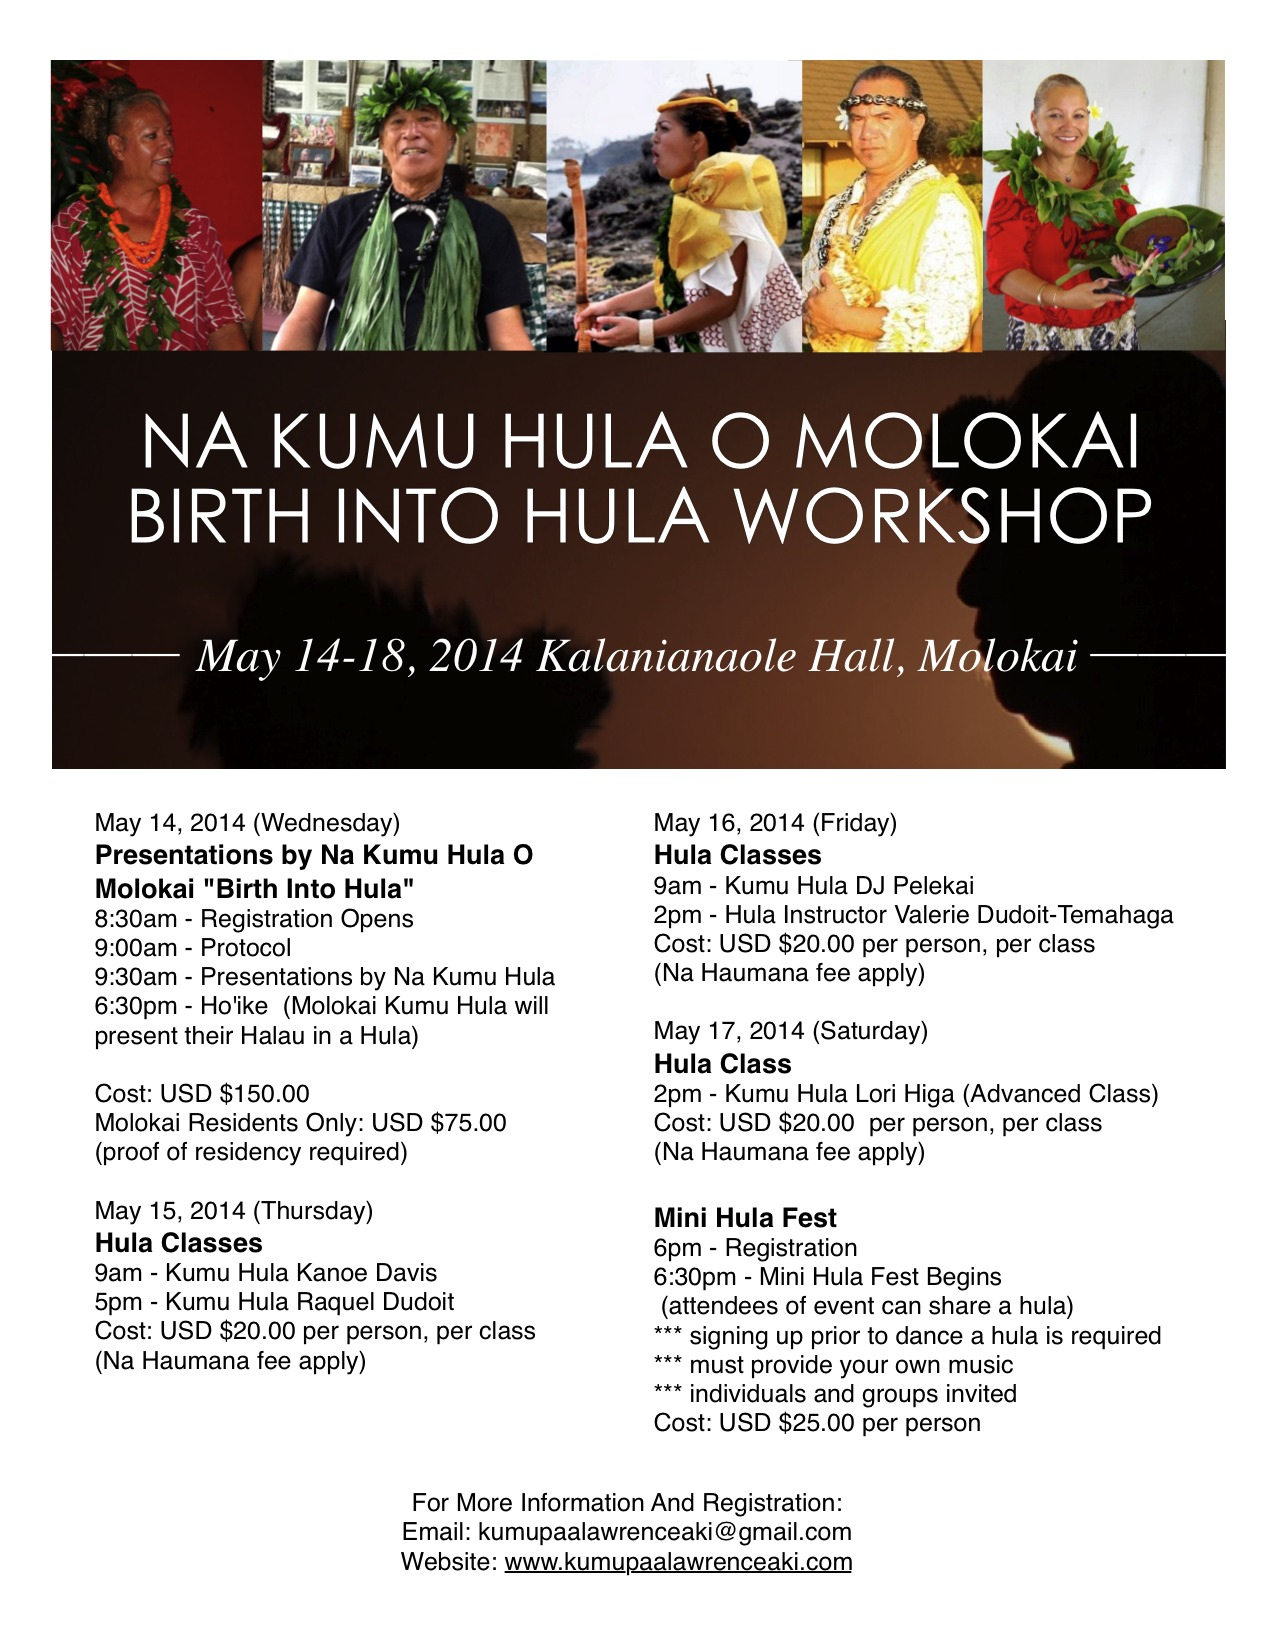 Na Kumu Hula O Molokai Birth Into Hula Workshop Program April 17